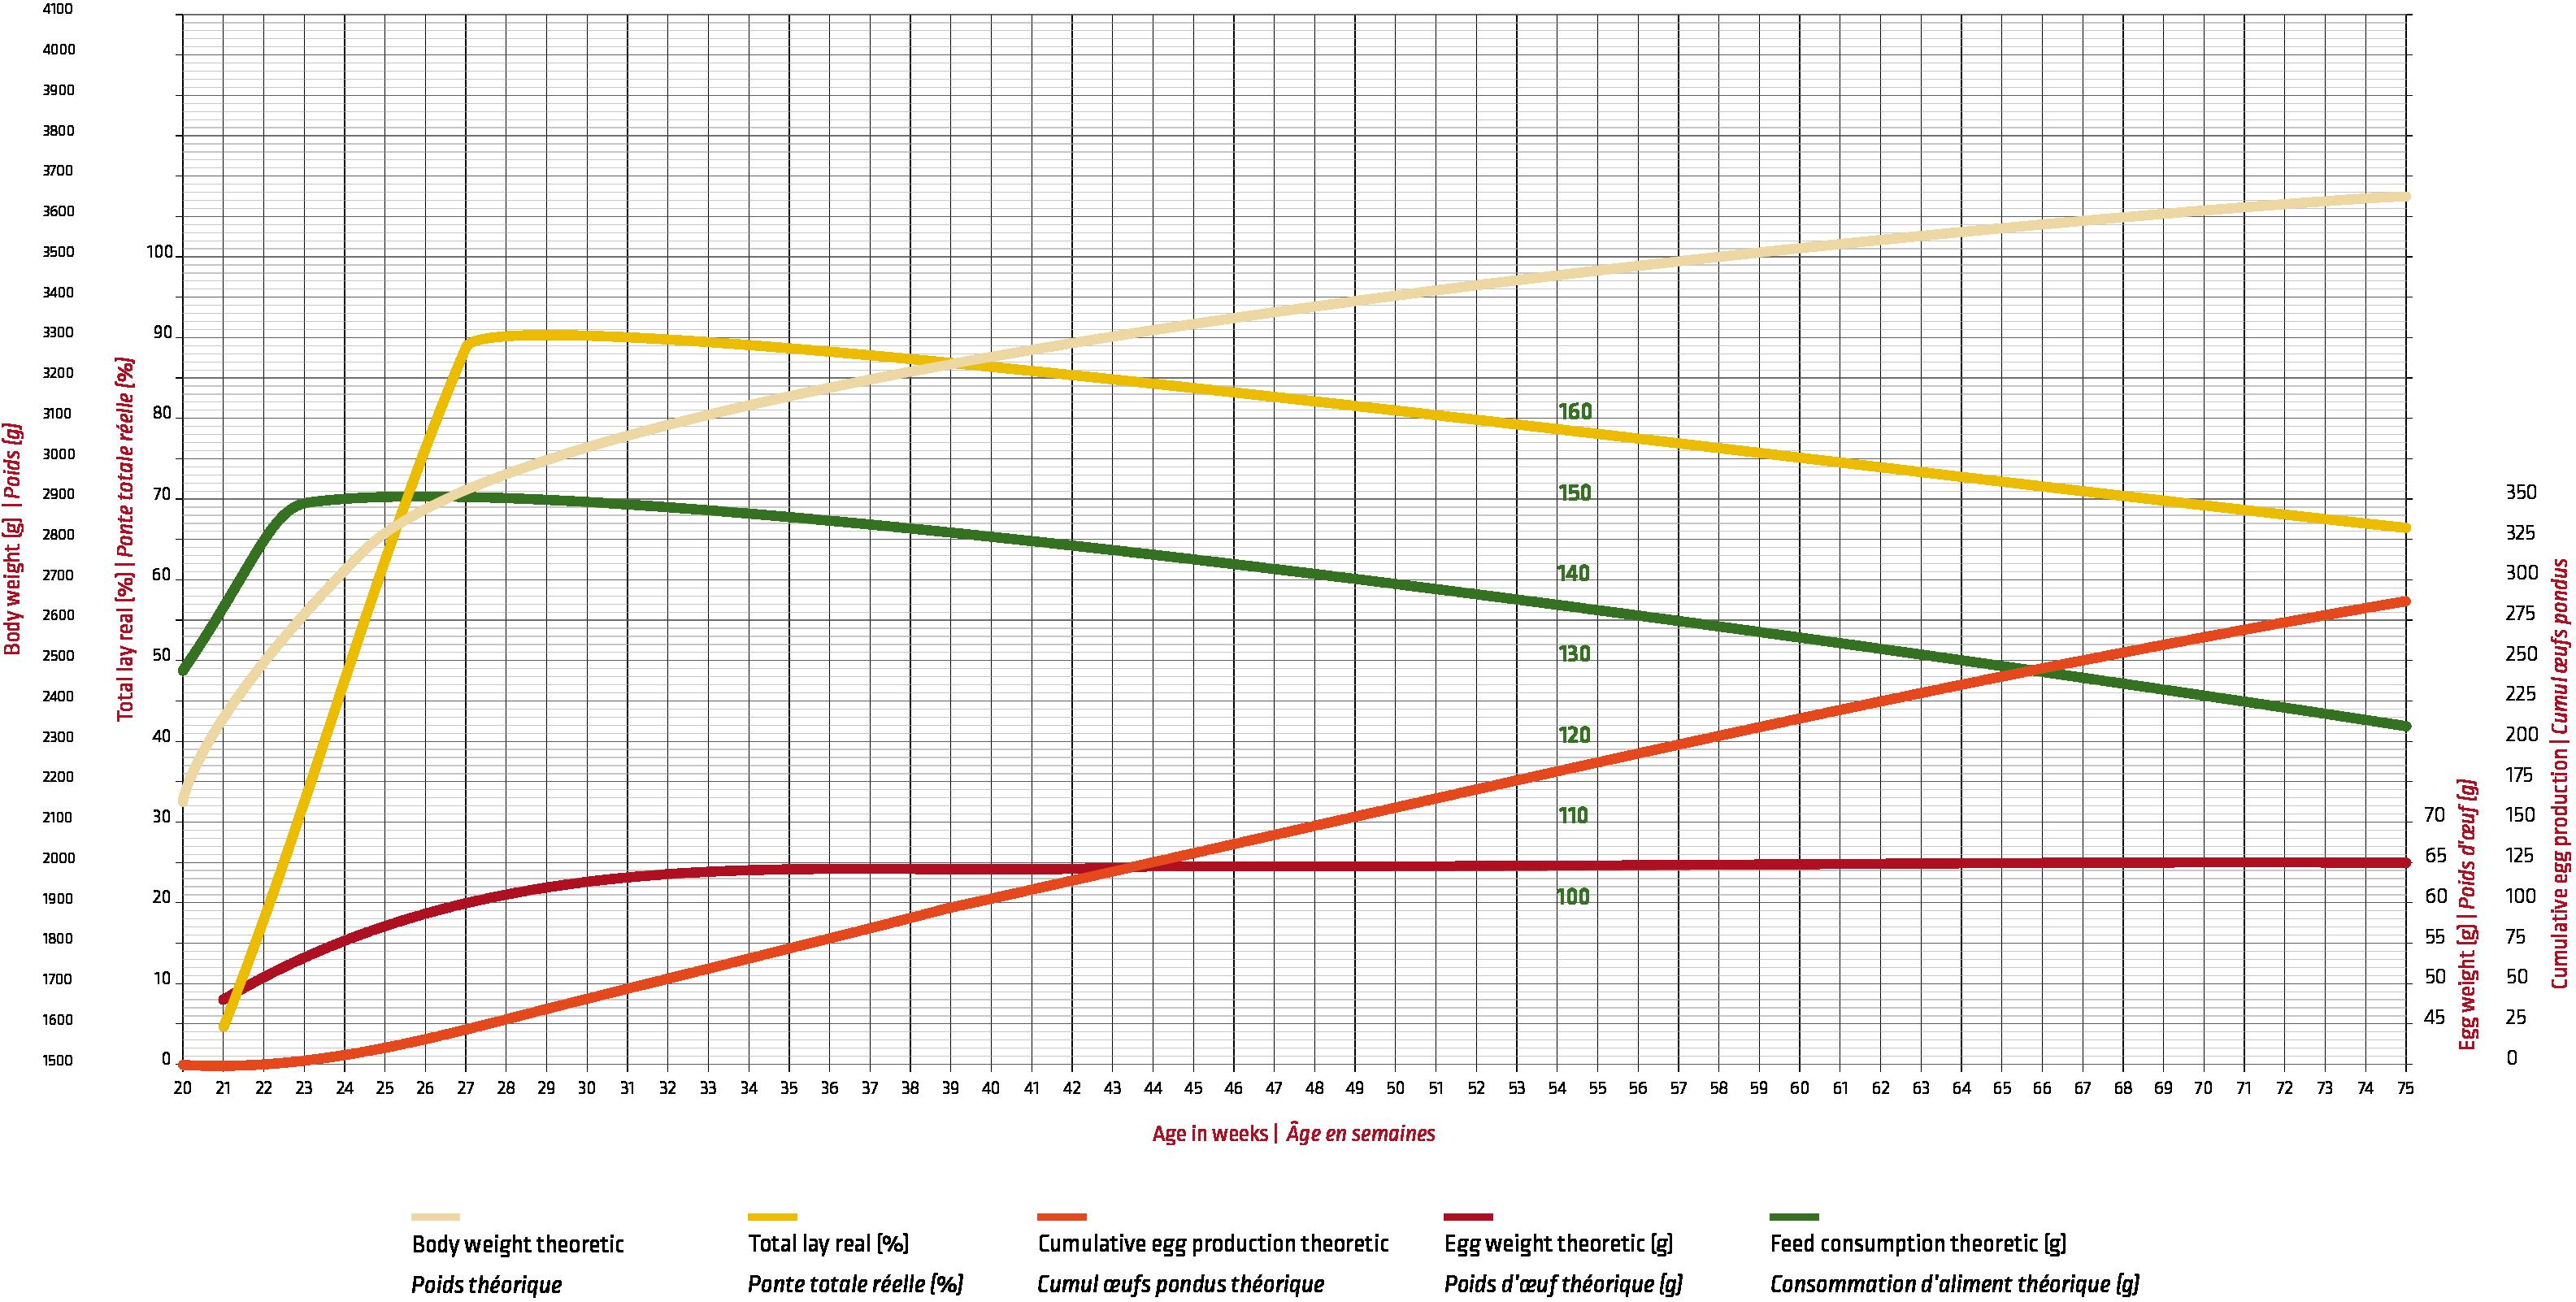 Irona_Africa_Laying chart.png